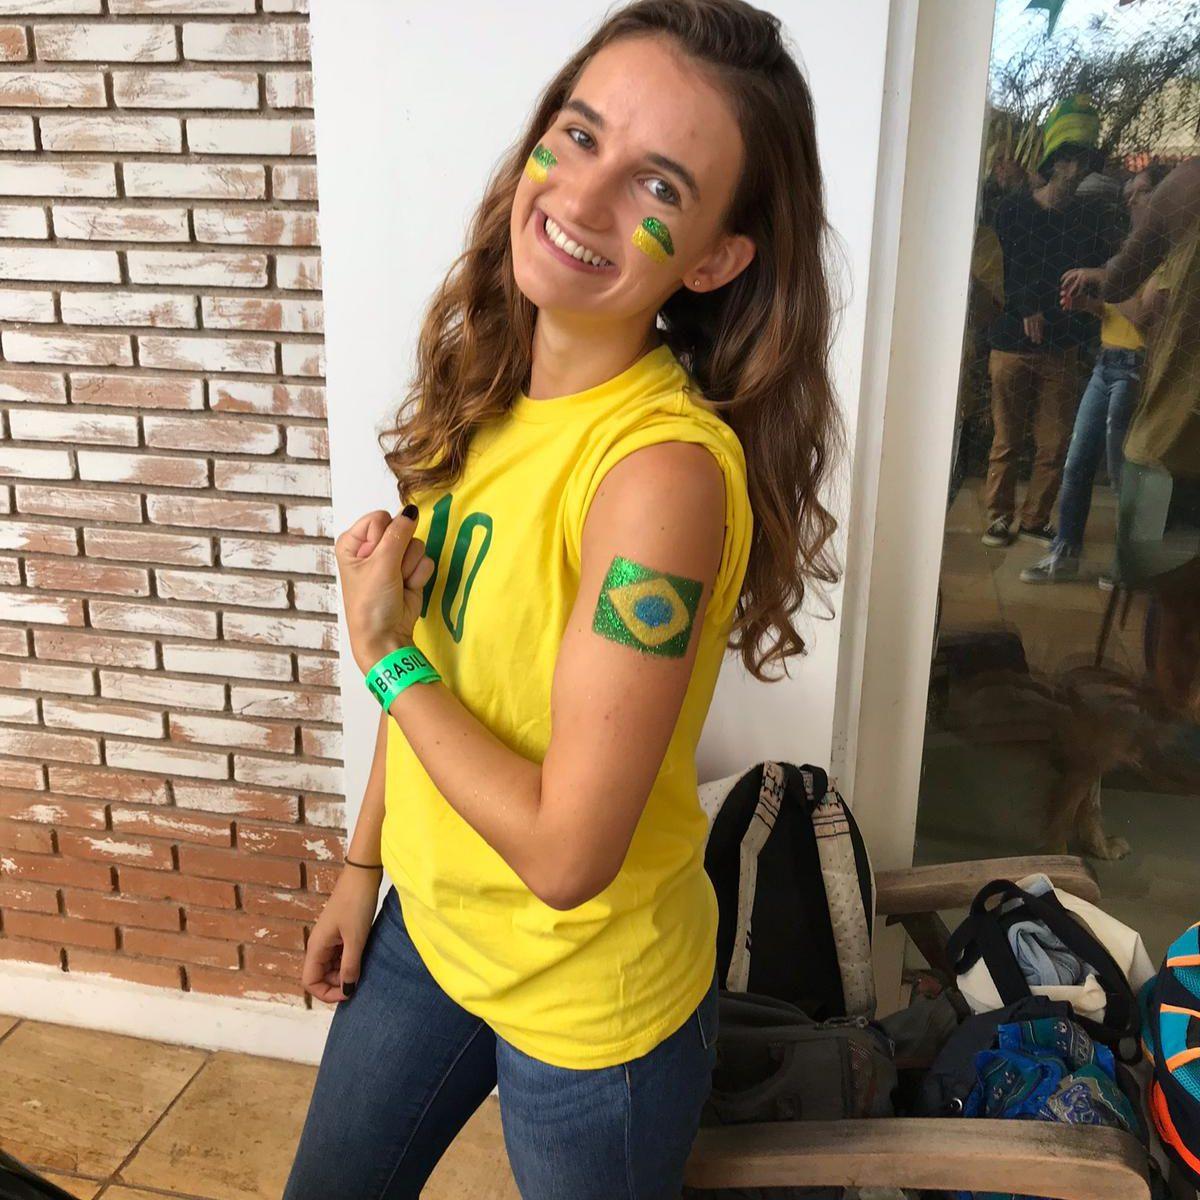 EduMais volunteer Emily volunteering in the favelas as an English teacher on EduMais' English and Community English programs in Rio de Janeiro